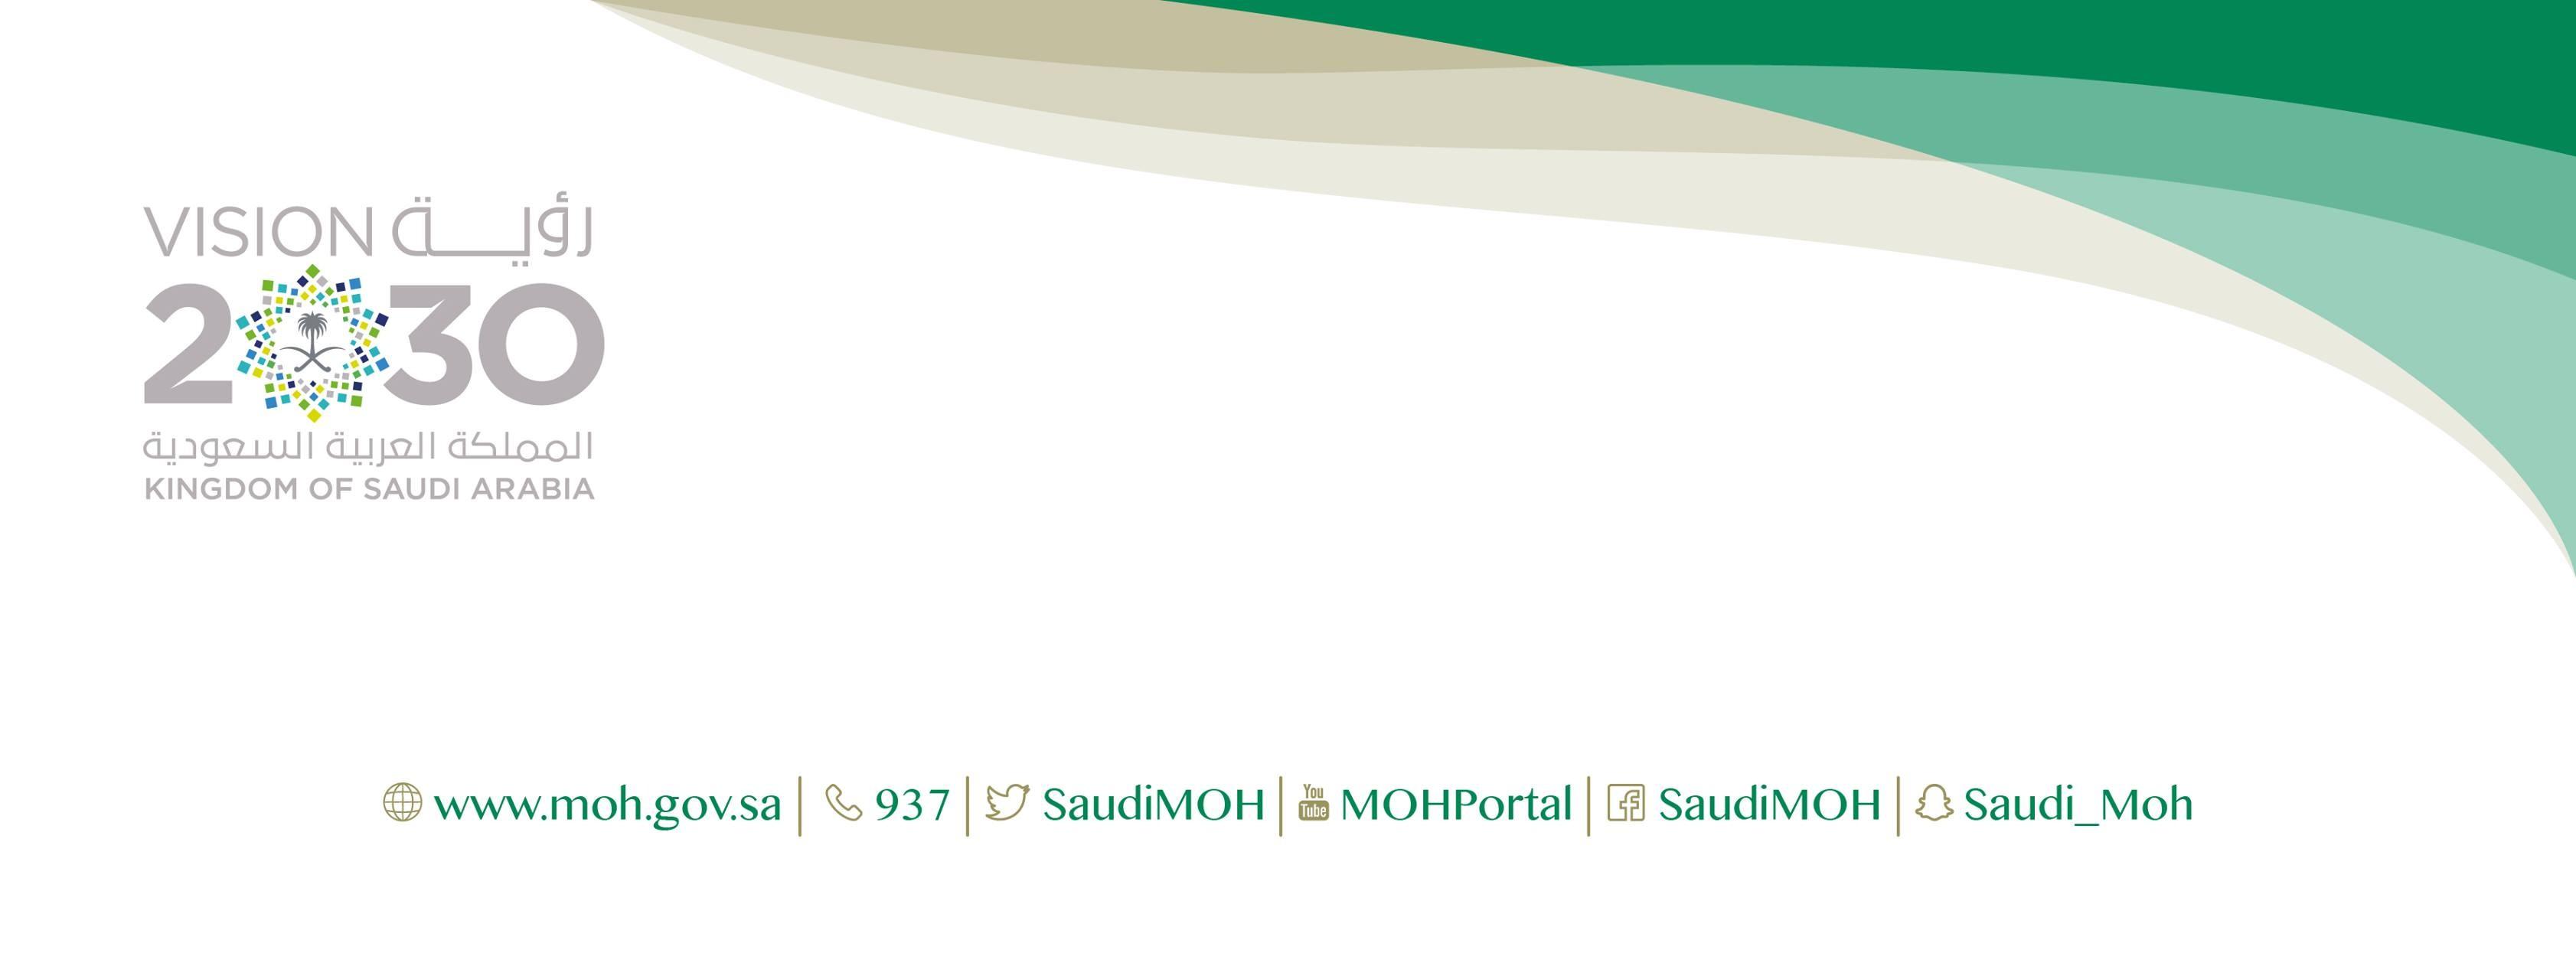 Ministry of Health Saudi Arabia | LinkedIn